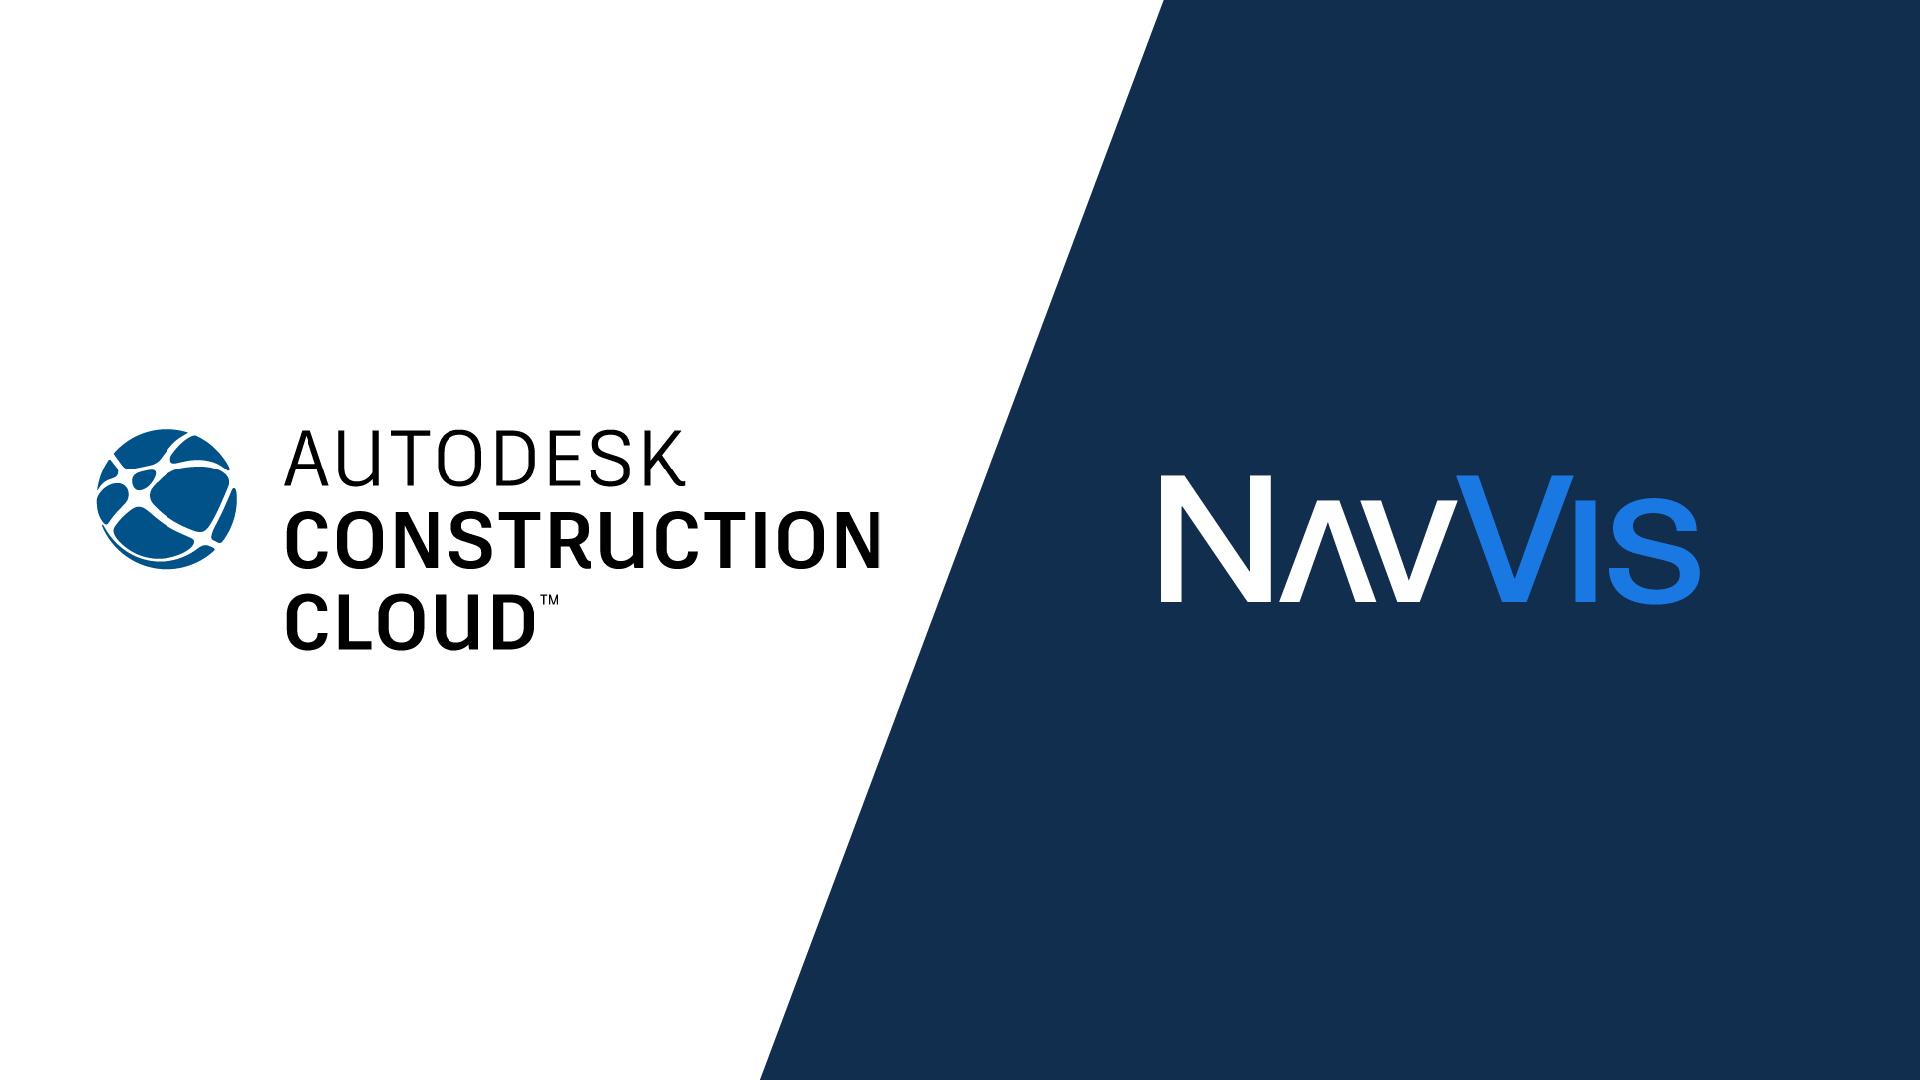 Autodesk-Integration-Blogpost-logos